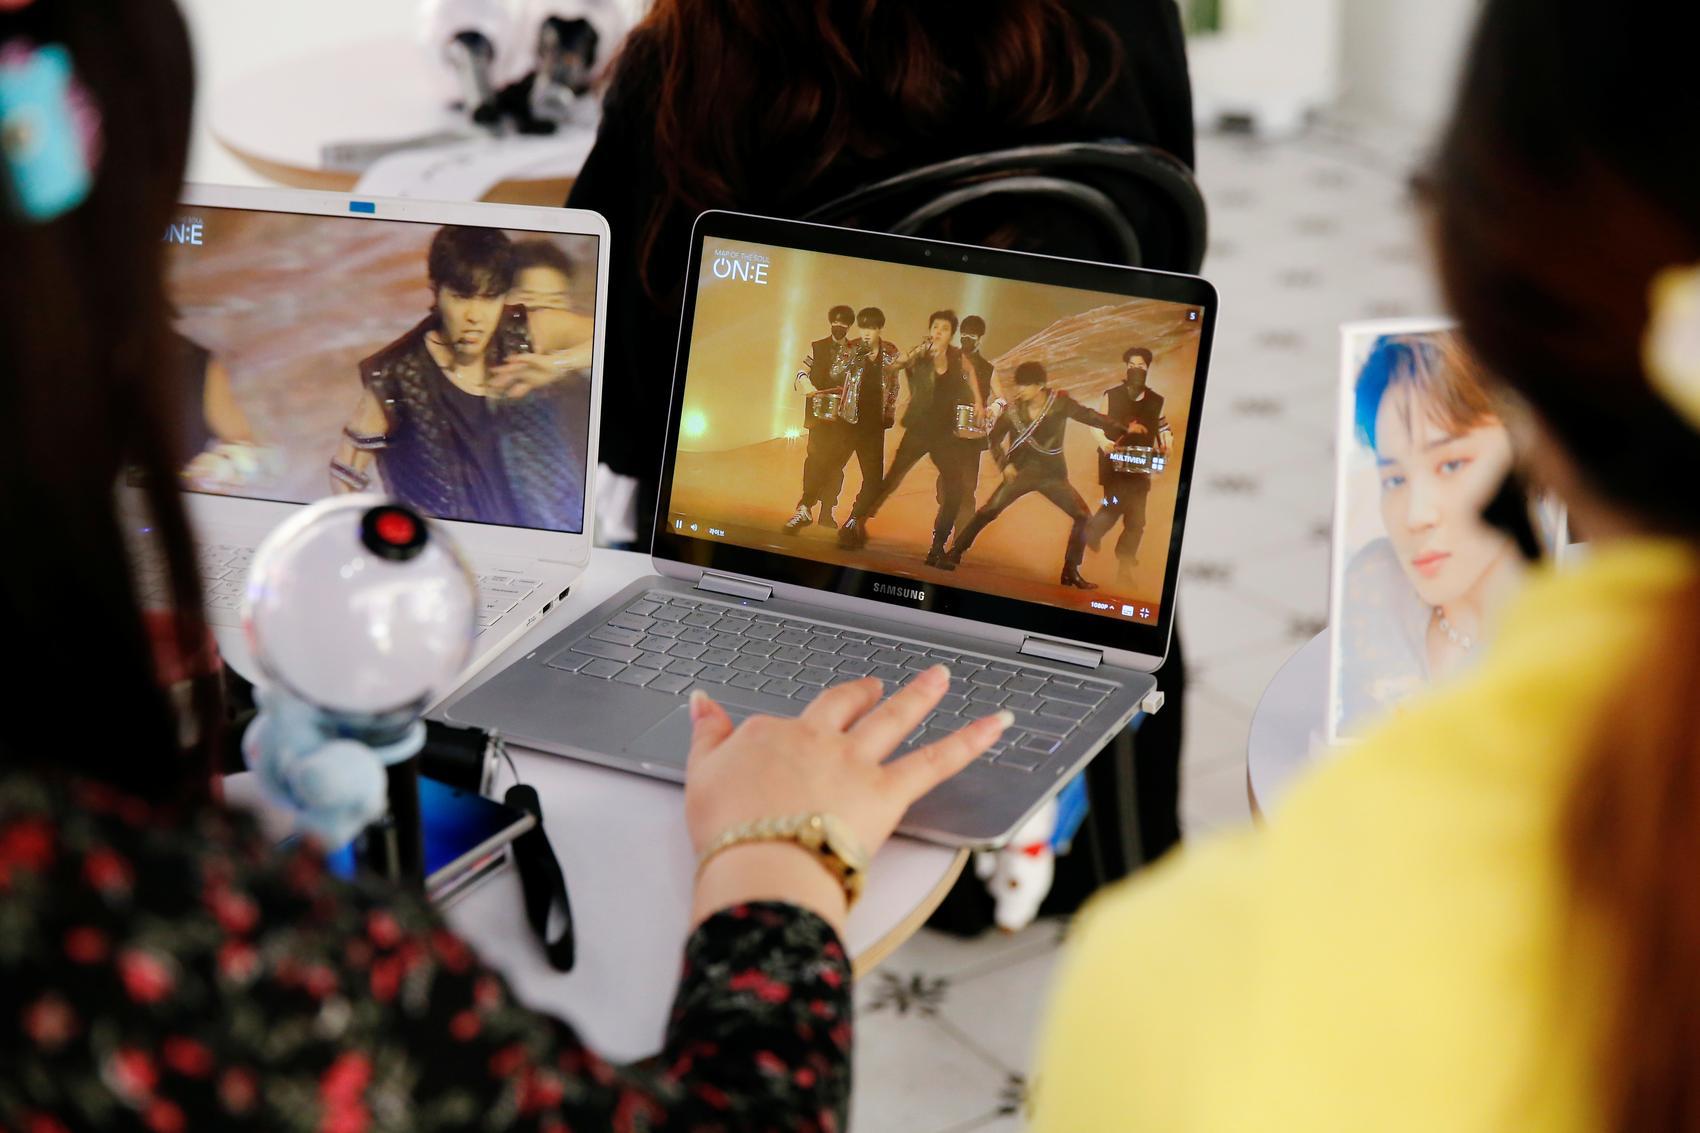 K-pop titan BTS's online concert draws global fans